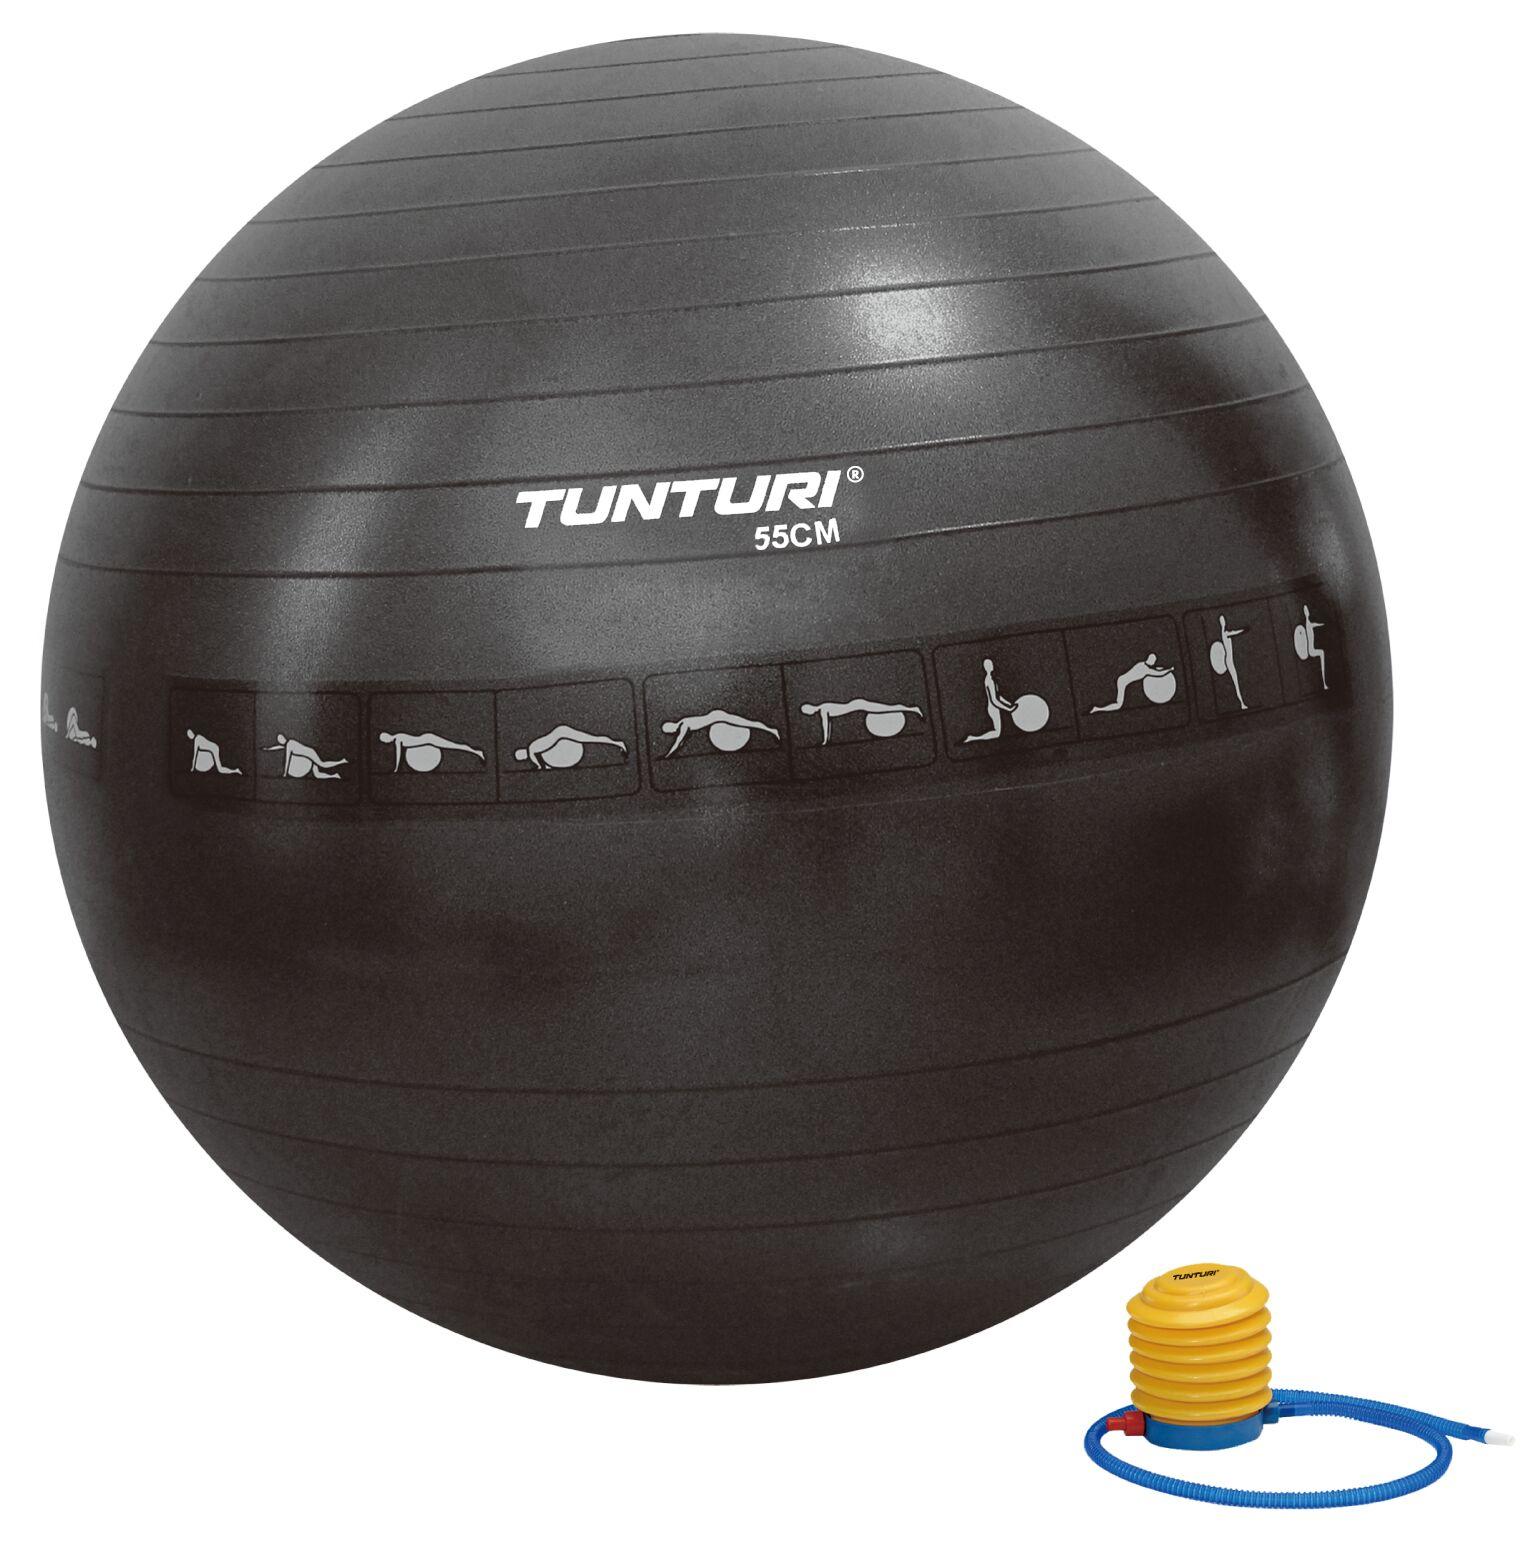 Tunturi Anti-Burst Fitnessbal 55cm